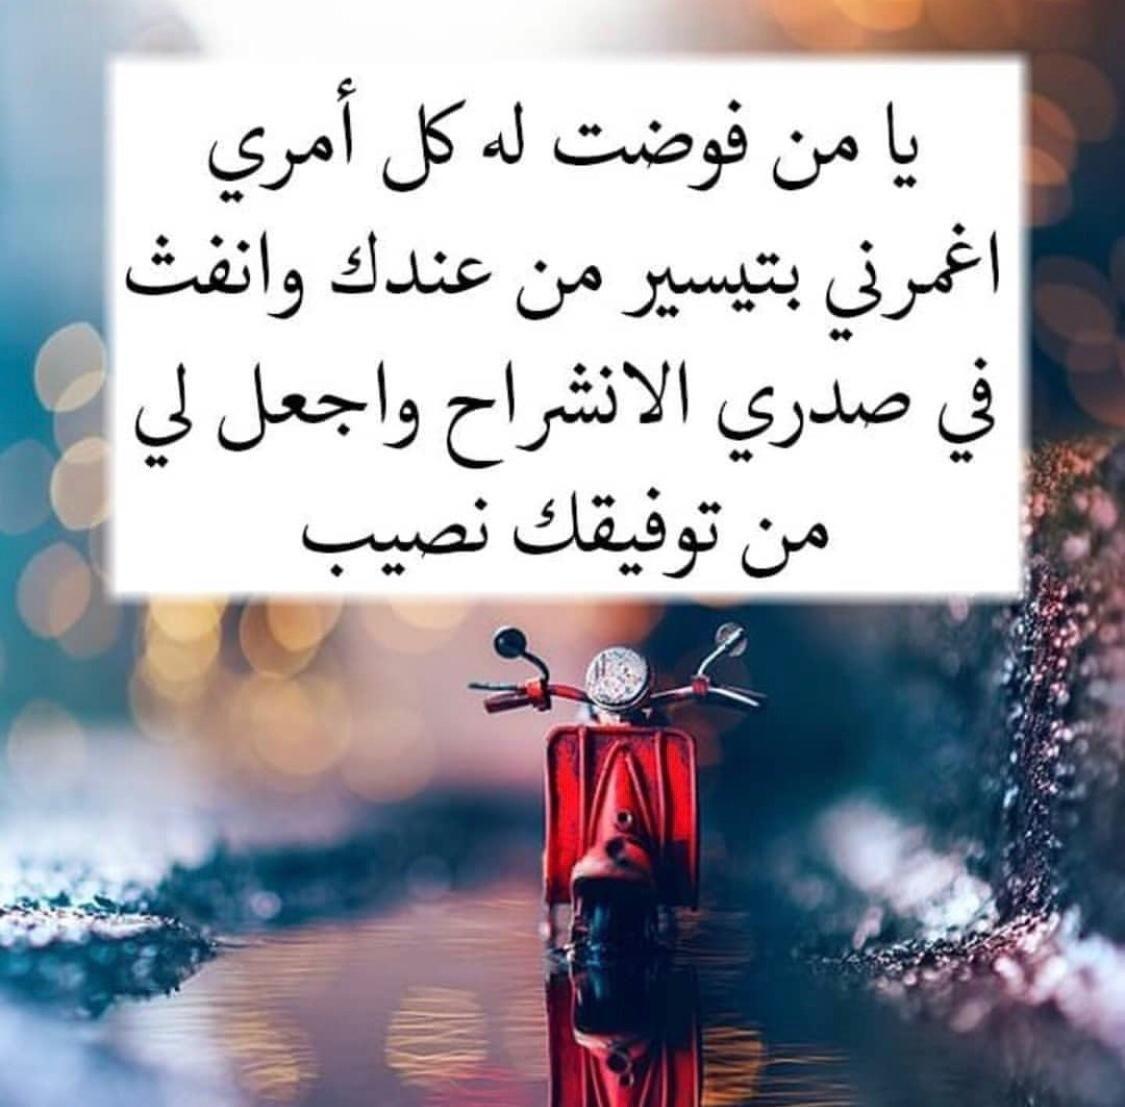 Pin By Anouar Aljana On Duaa Islam Islamic Quotes Quran Duaa Islam Islamic Quotes